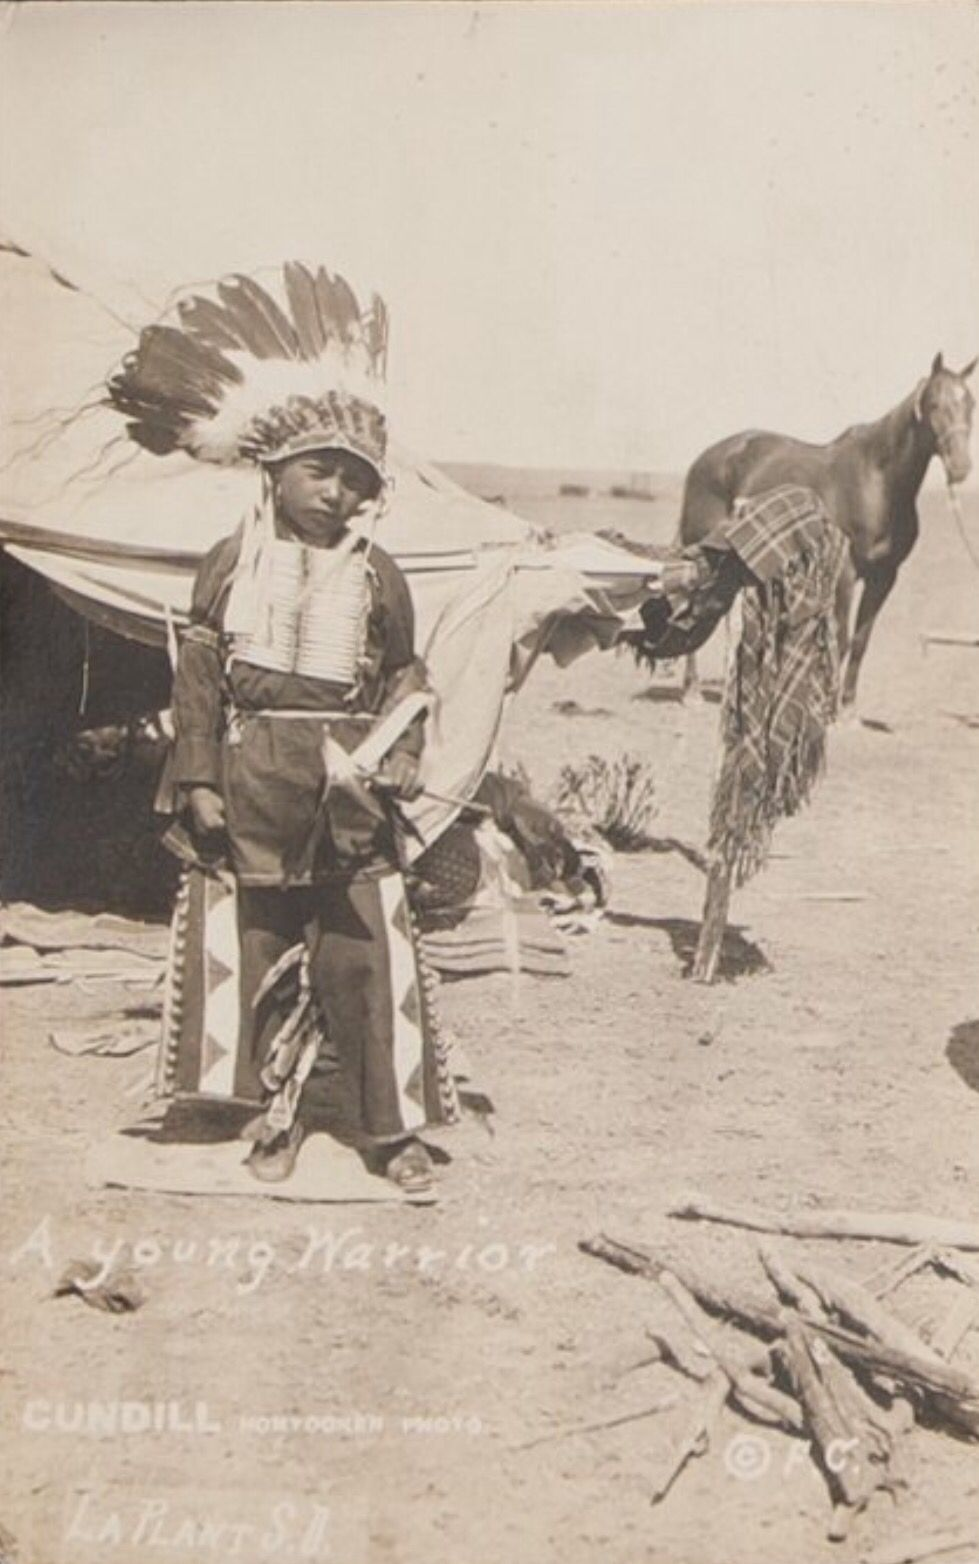 "Фотография из Резервации Пайн Ридж. Коллекция Rev. A. Fulton Johnson. ""American Indian, Pre-Columbian & Tribal Art Signature Auction"", Даллас. 10 мая 2013."